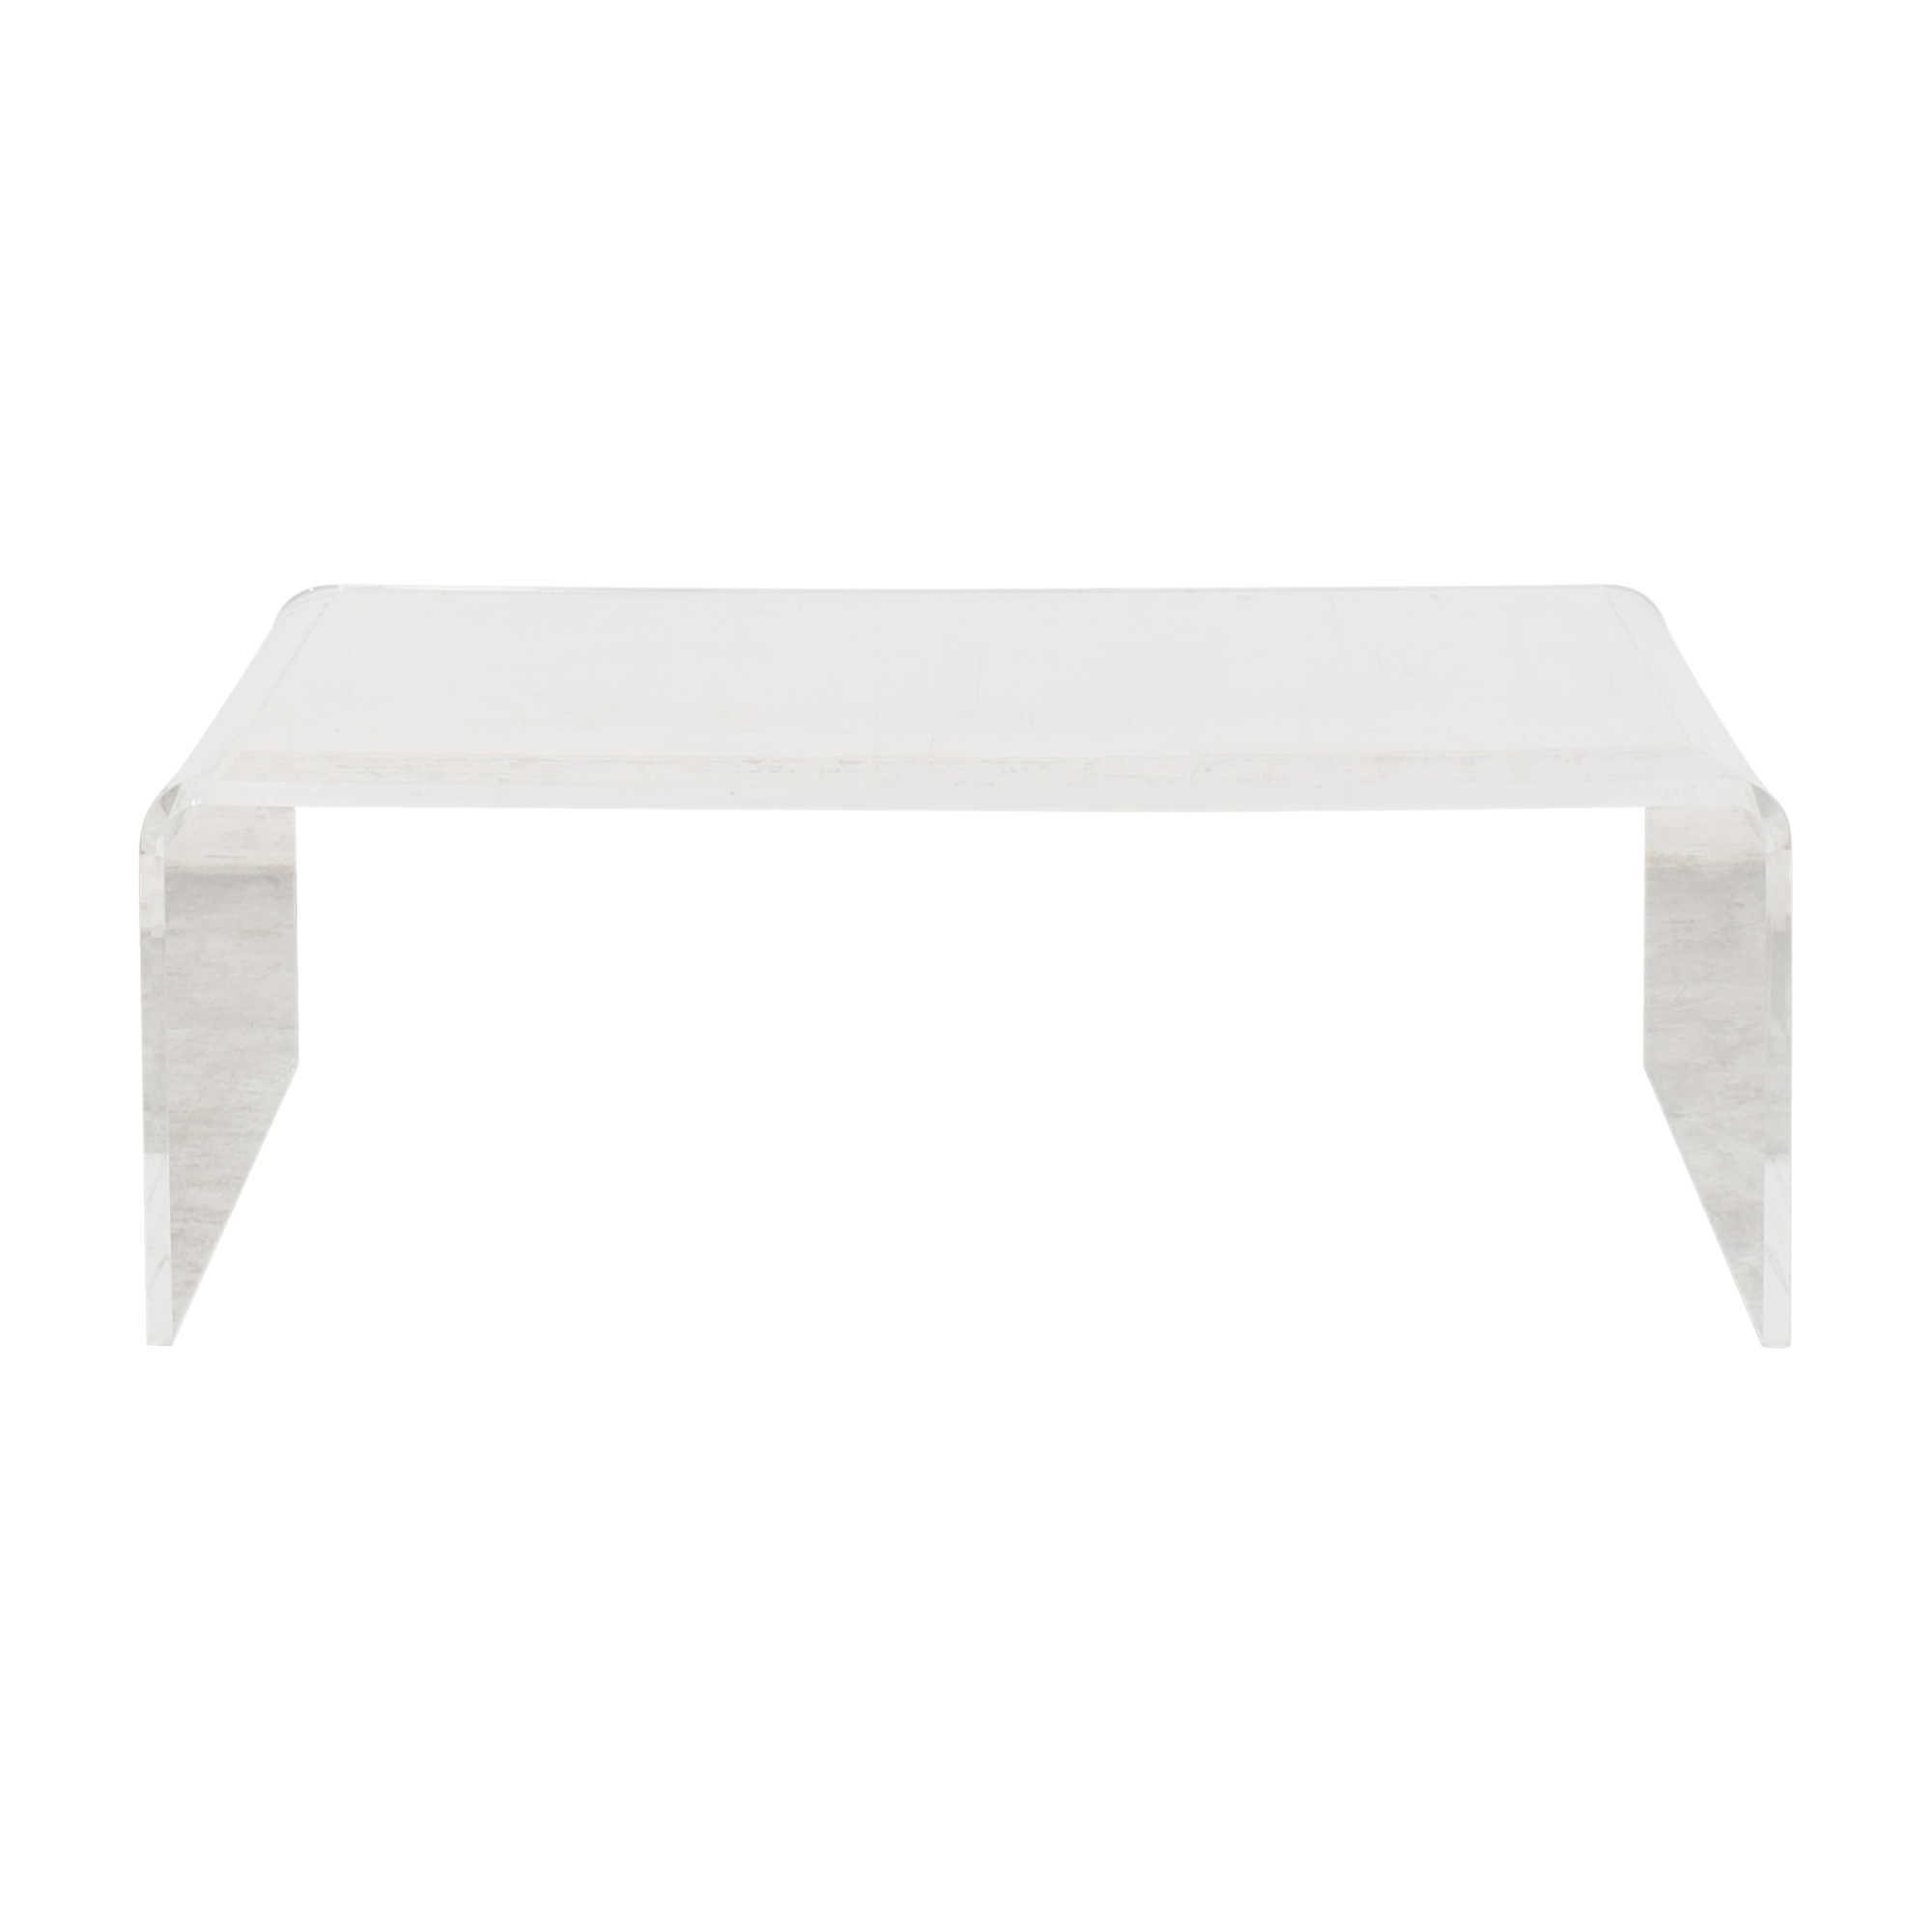 CB2 CB2 Peekaboo Tall Transparent Coffee Table